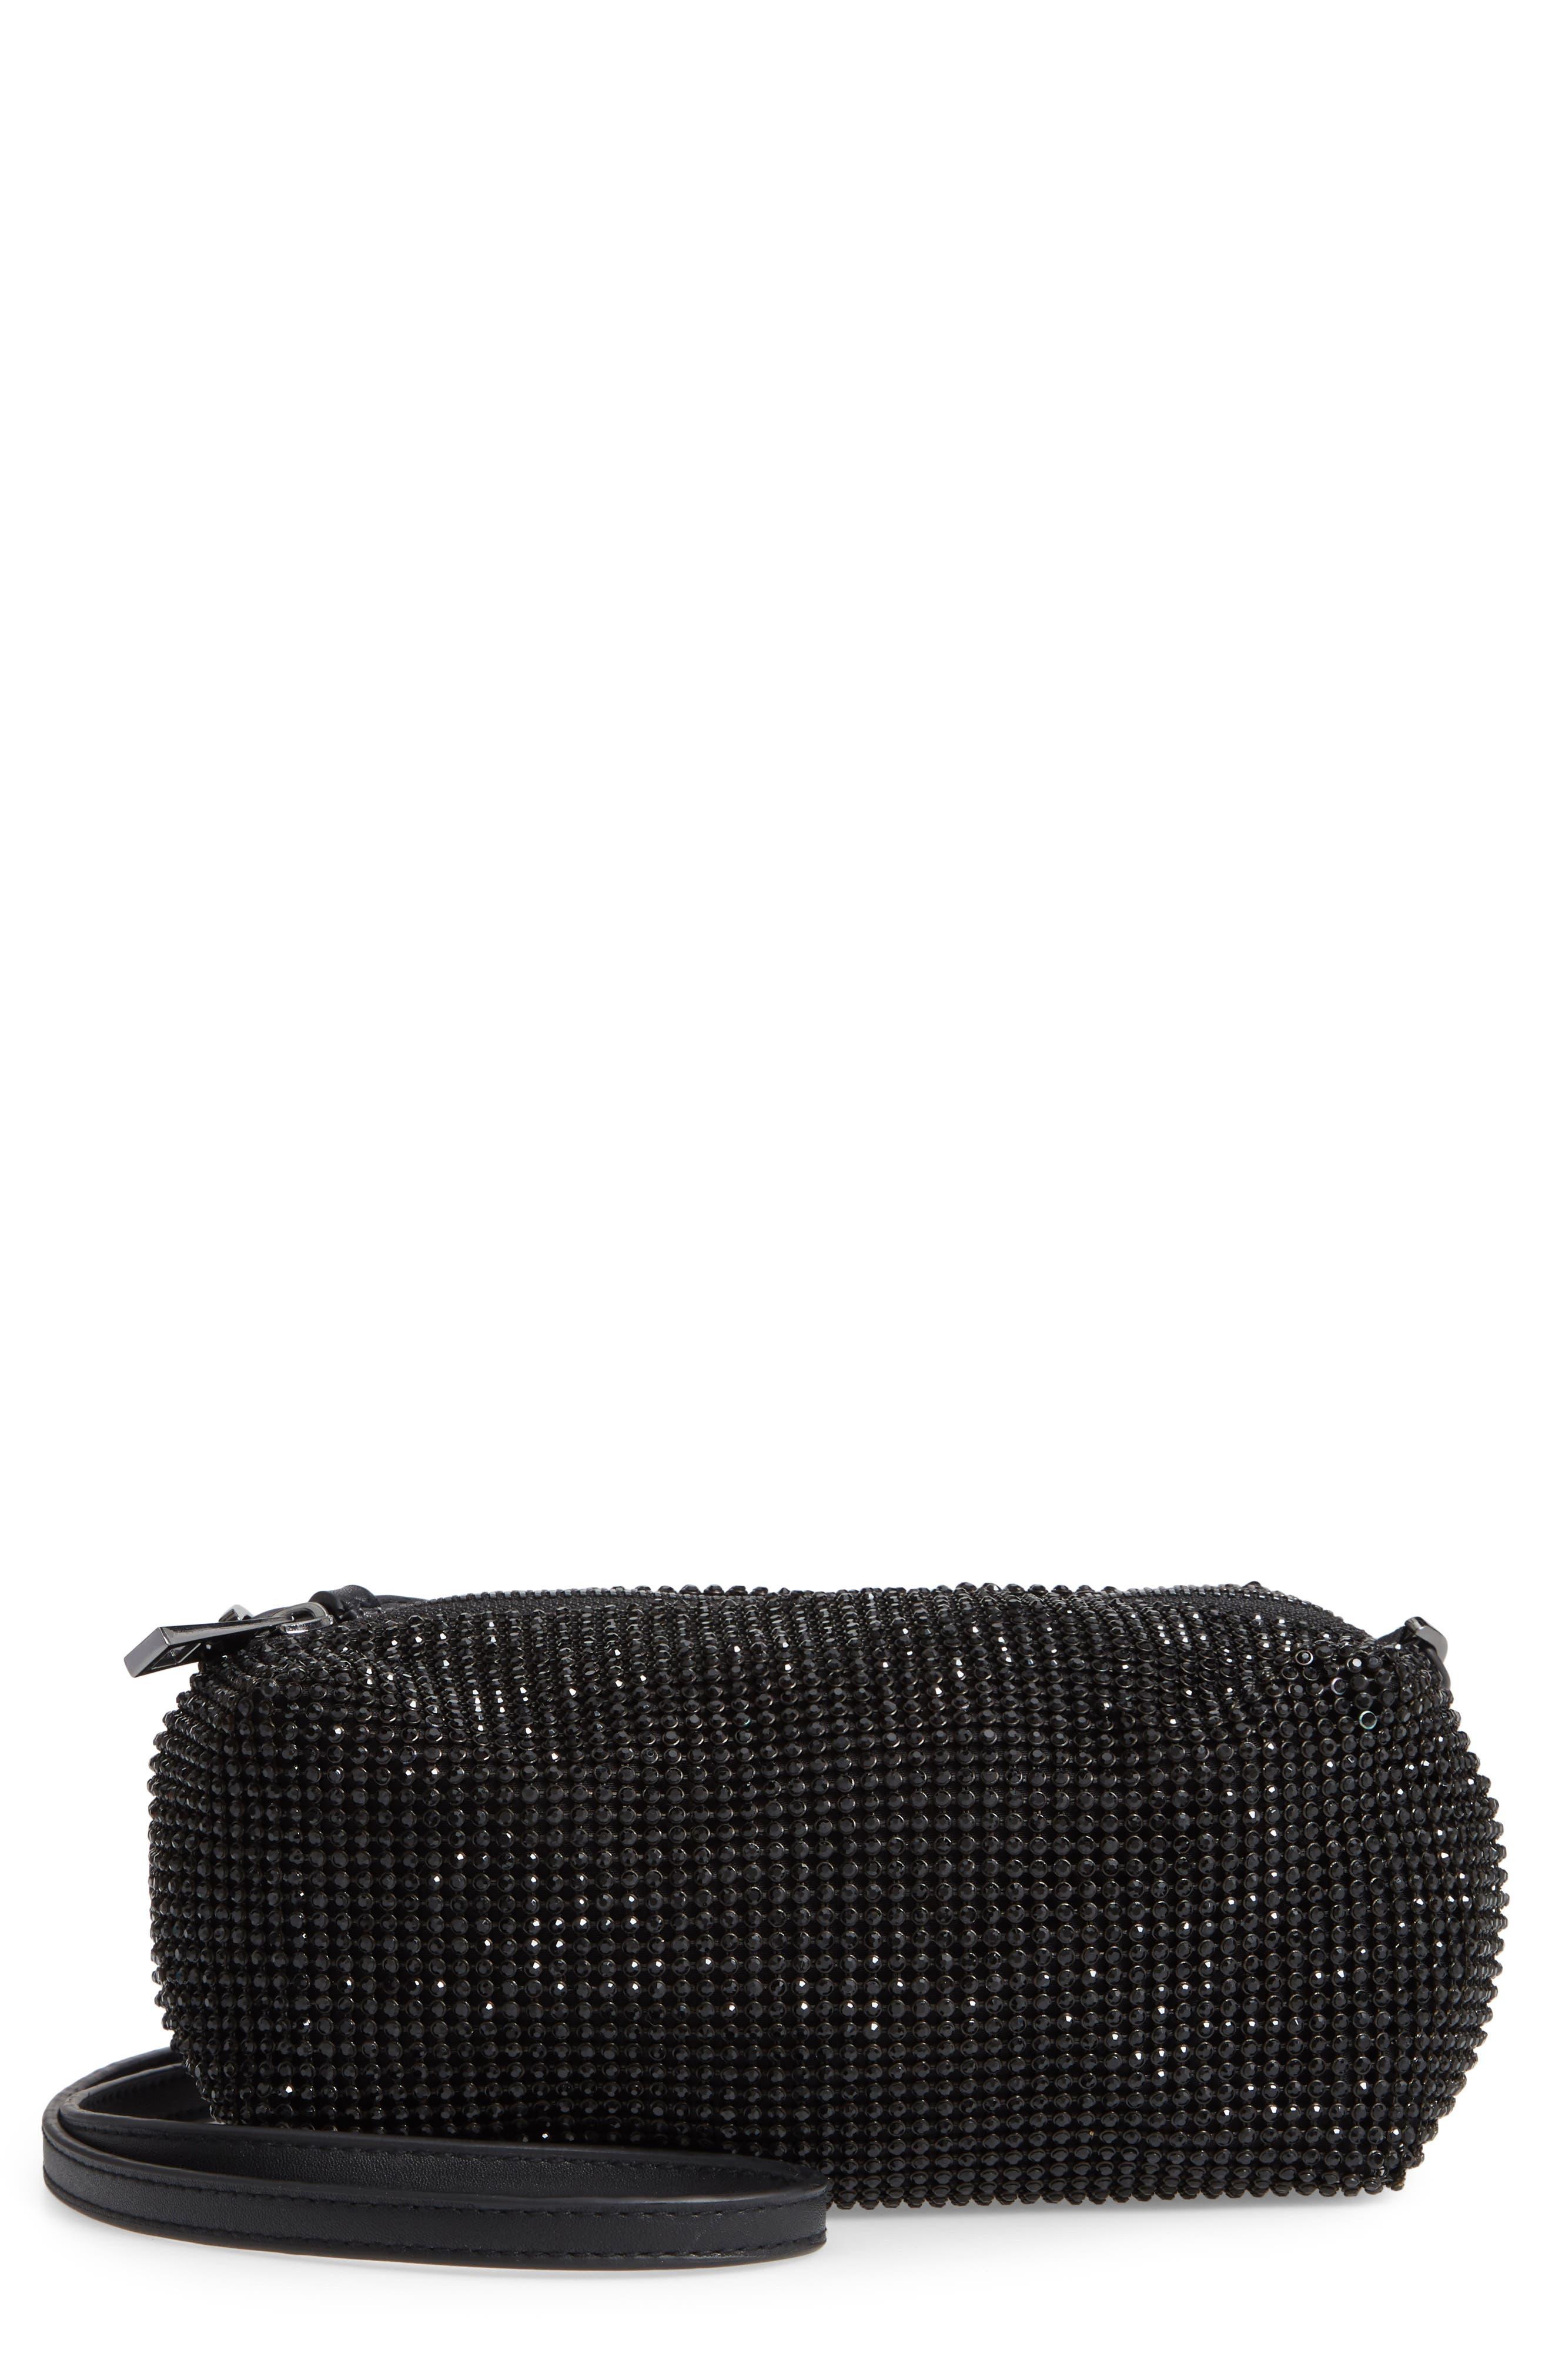 Chia Crystal Embellished Crossbody Bag,                         Main,                         color, BLACK